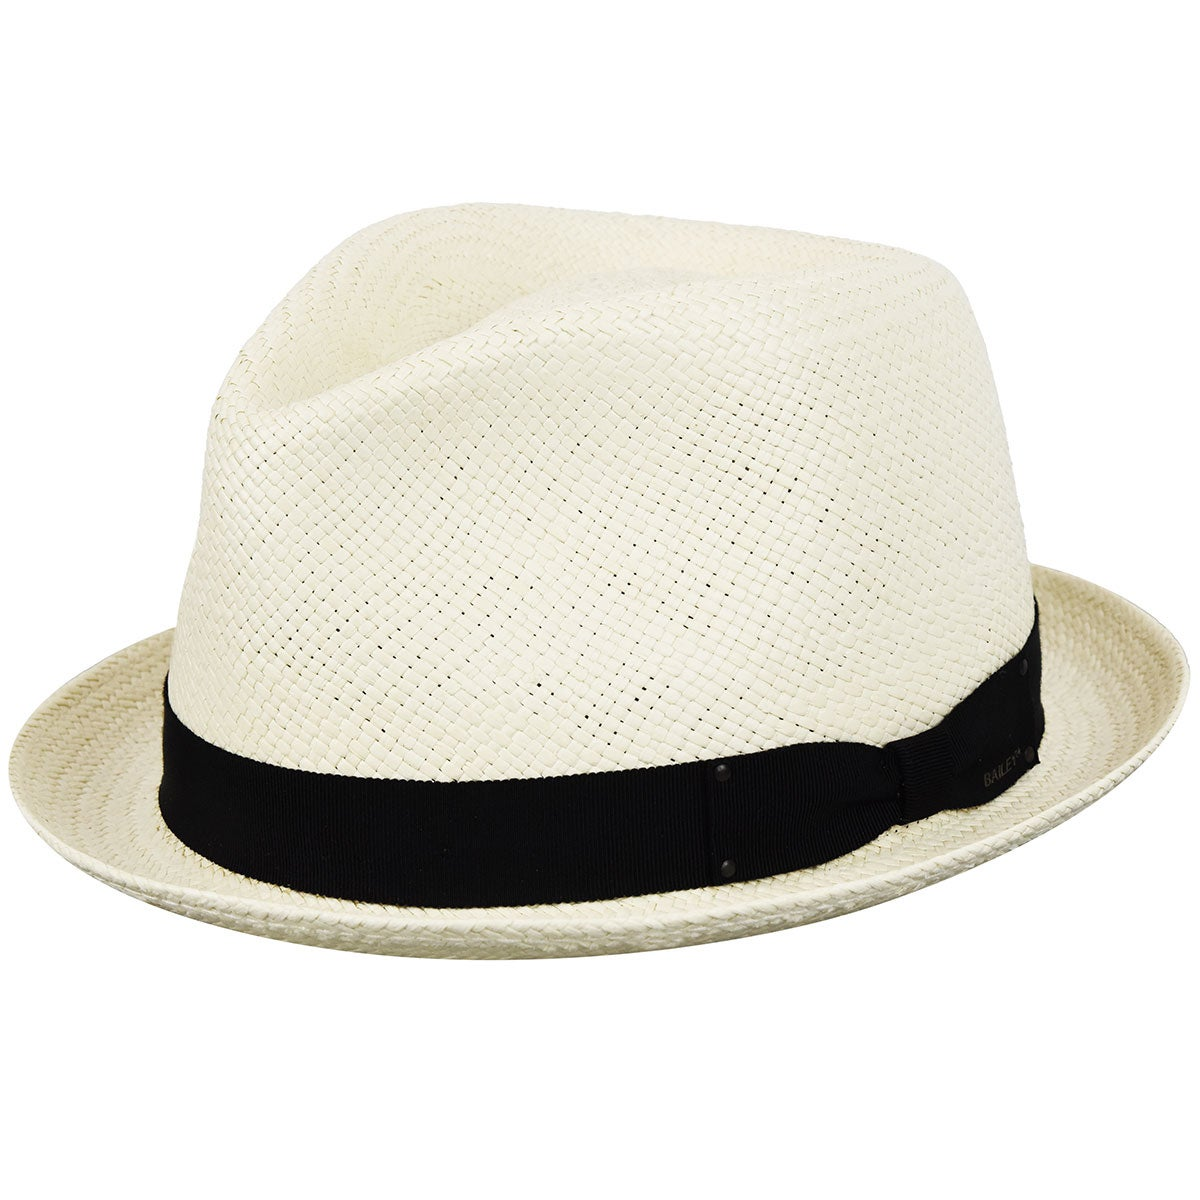 Men's Vintage Style Hats, Retro Hats Sydney Straw Panama Trilby $116.25 AT vintagedancer.com